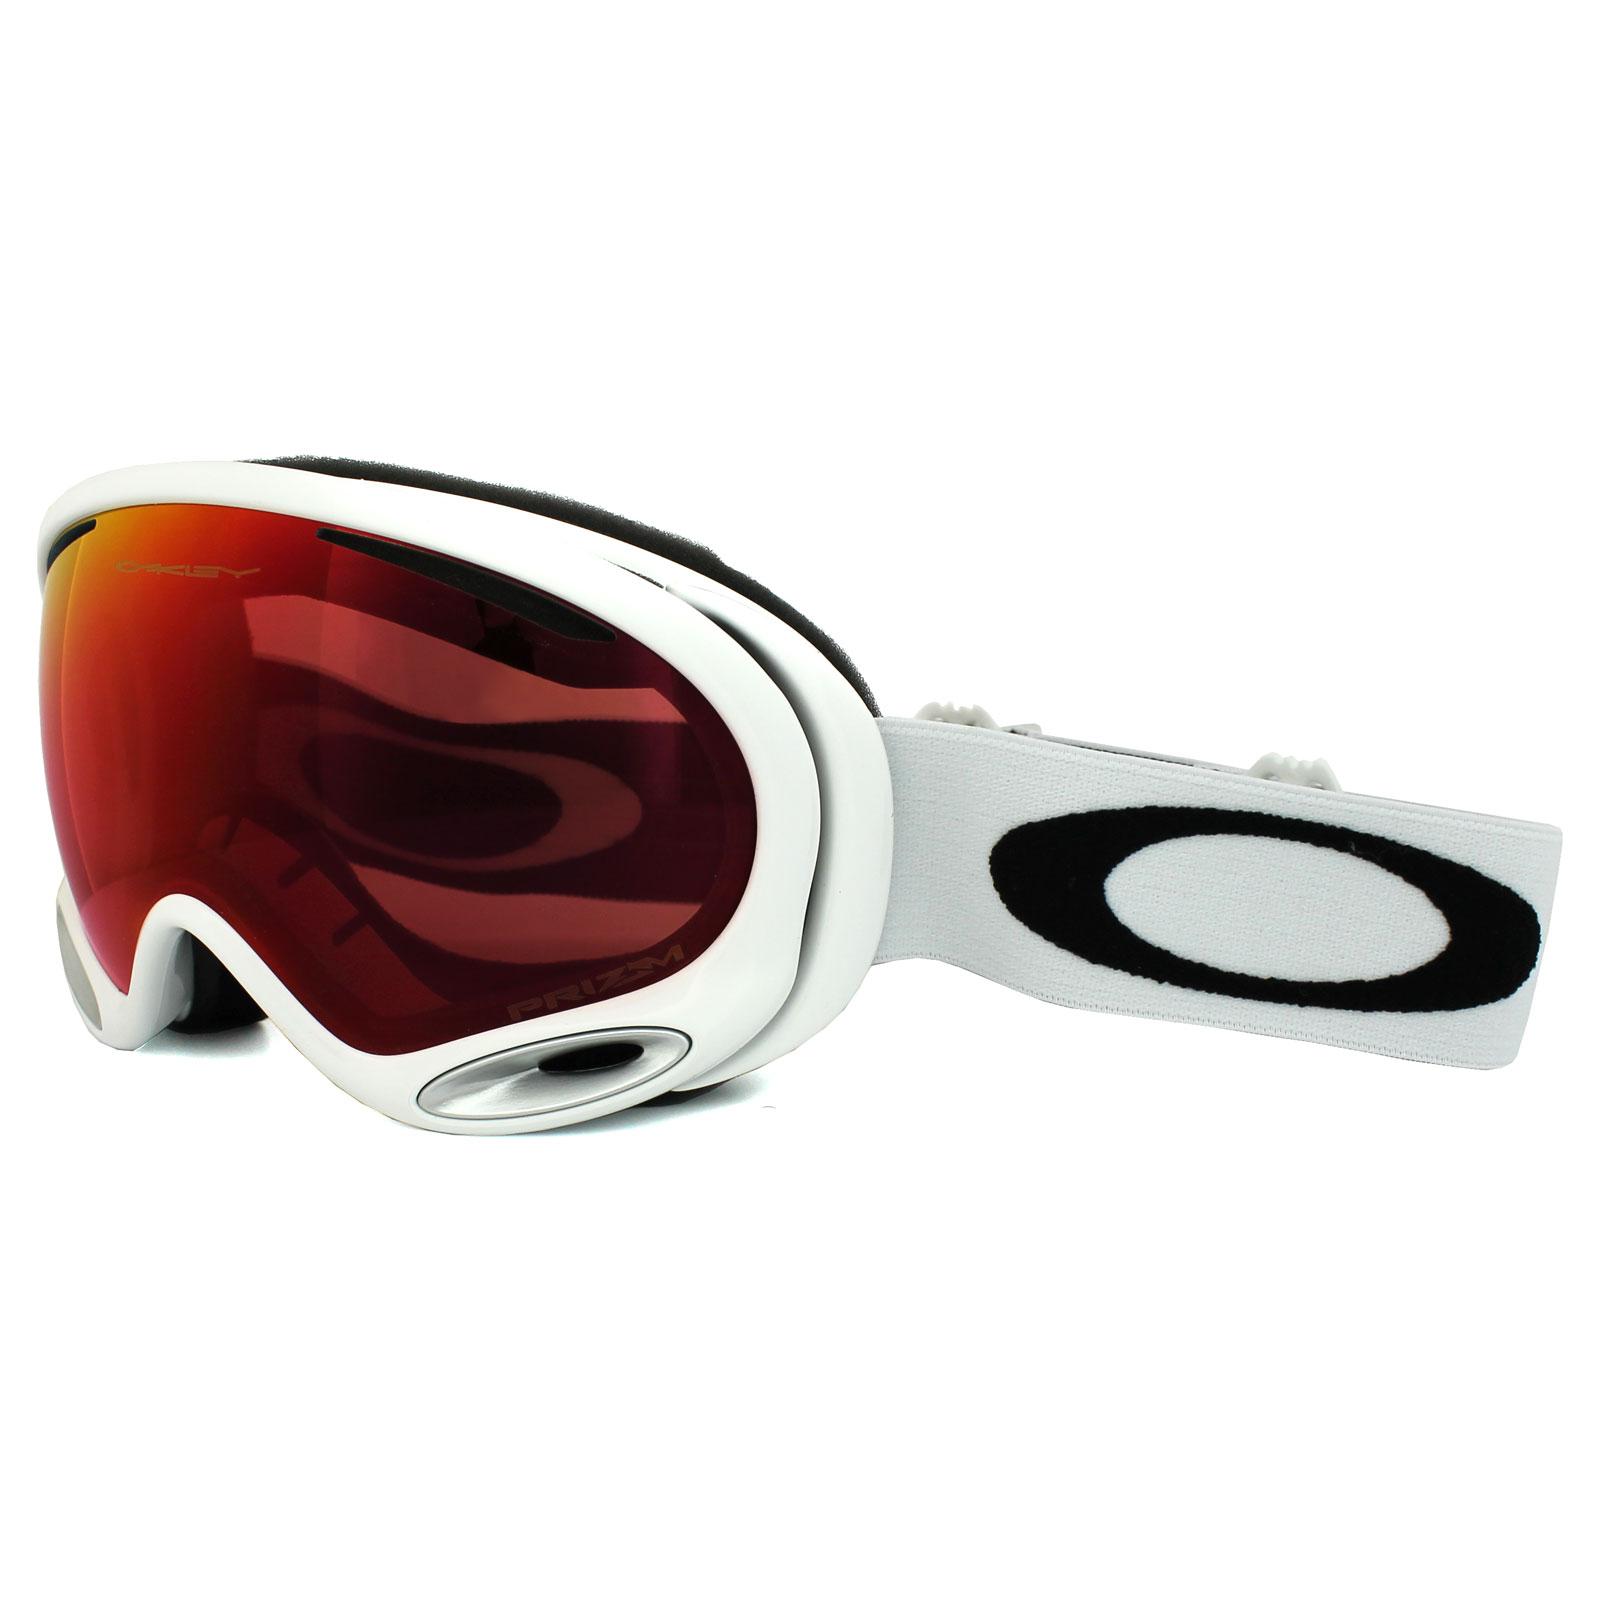 oakley ski goggles a frame  Oakley Ski Snow Goggles A Frame 2.0 OO7044-50 Polished White Prizm ...